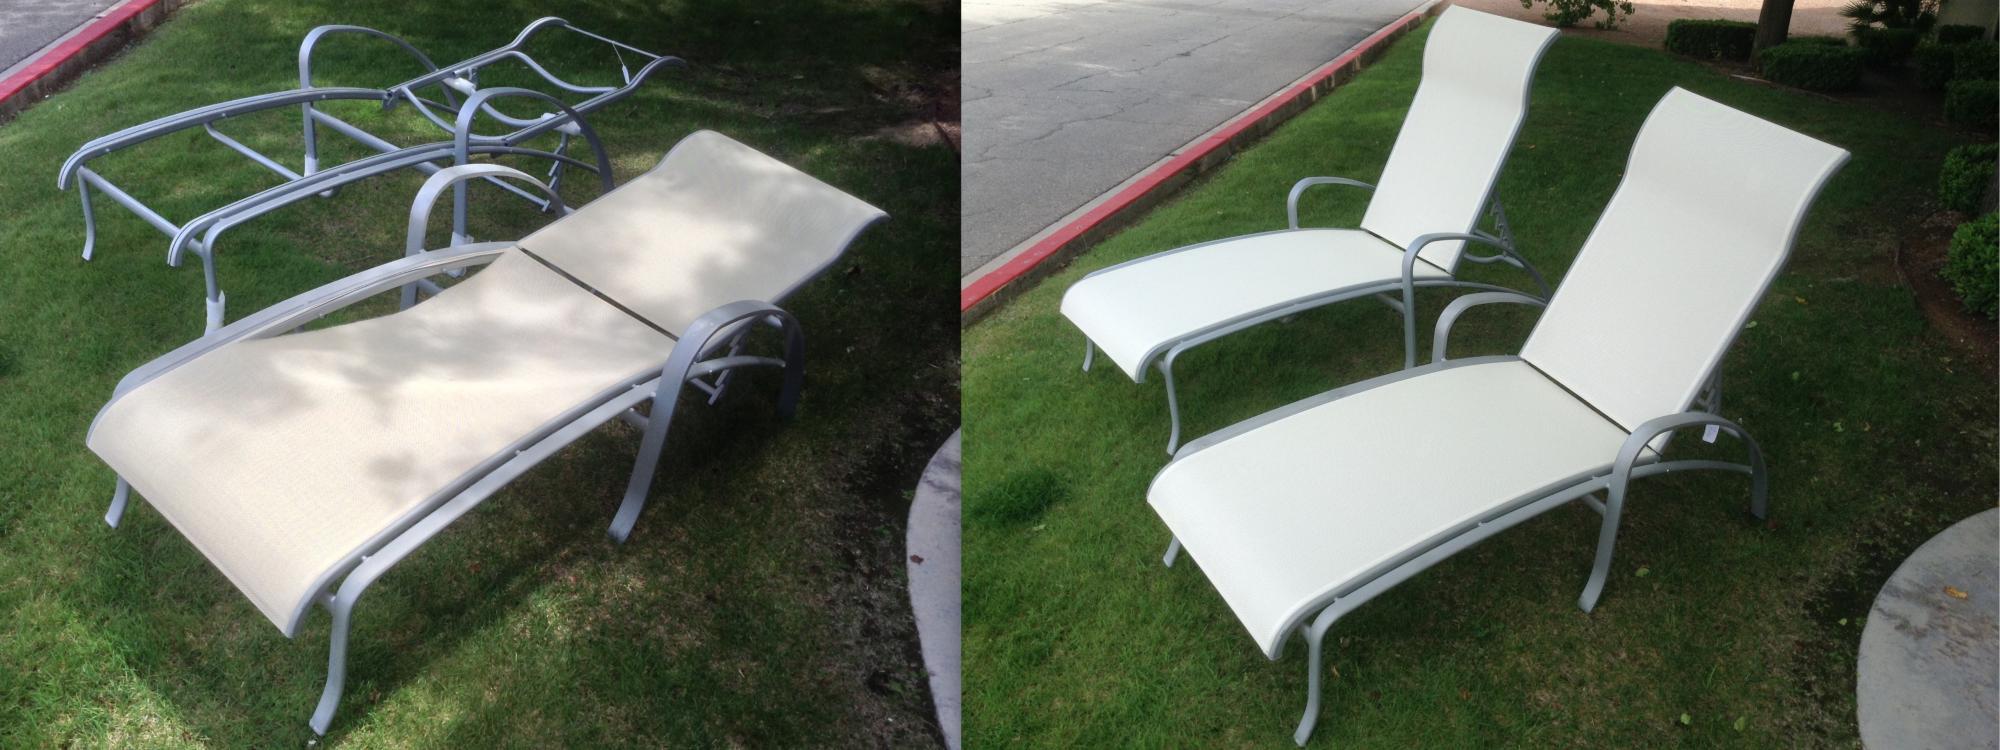 Furniture Sling Repair Mrs Patio Mr Pool And Mrs Patio - Tropitone outdoor furniture